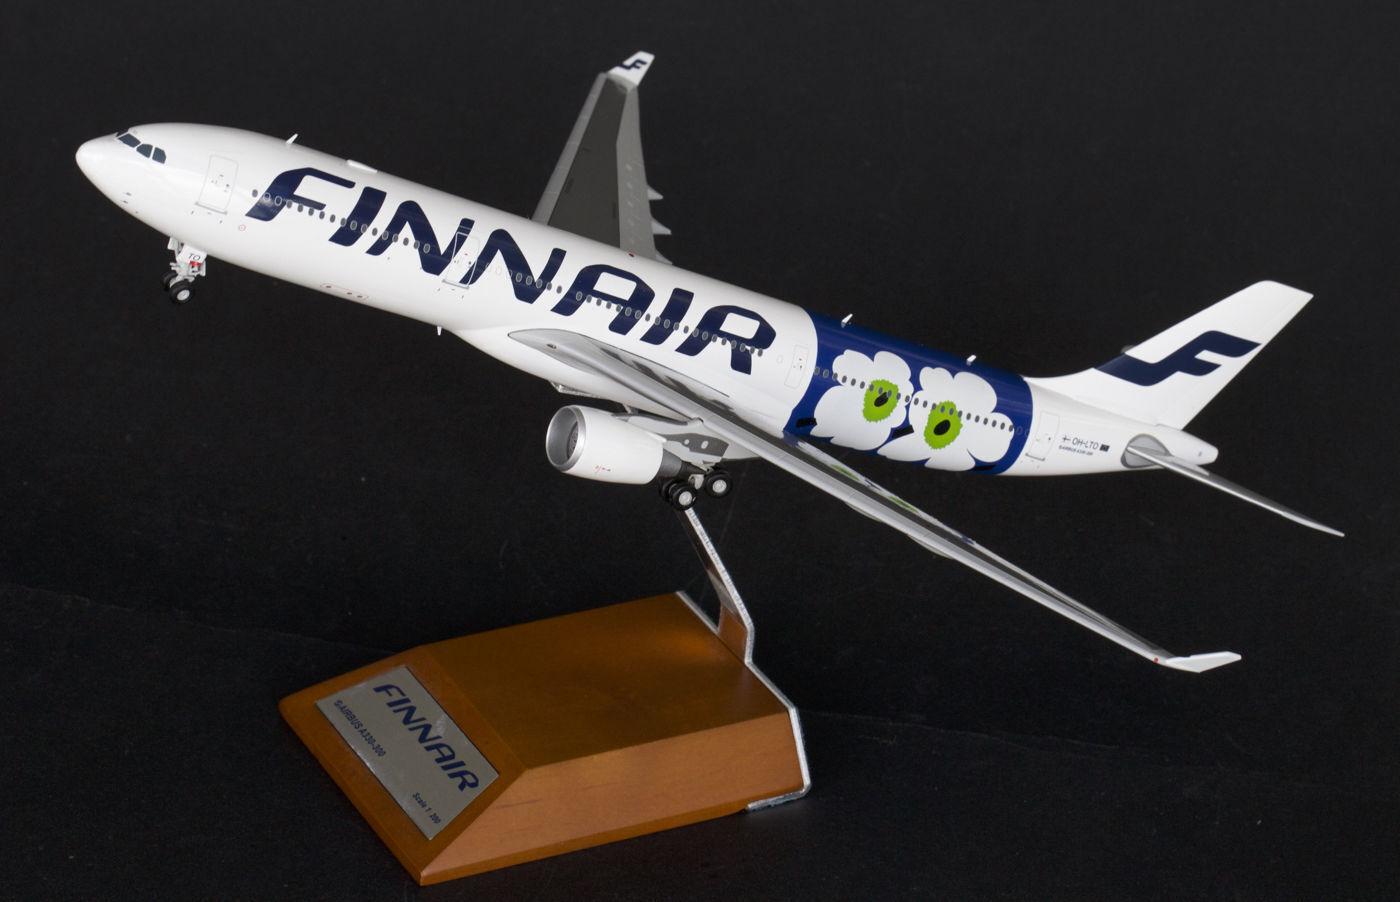 Negozio 2018 Jc Jc Jc Wings Jc2349 1 200 Finnair A330-300 Marimekko Oh-Lto  acquista marca